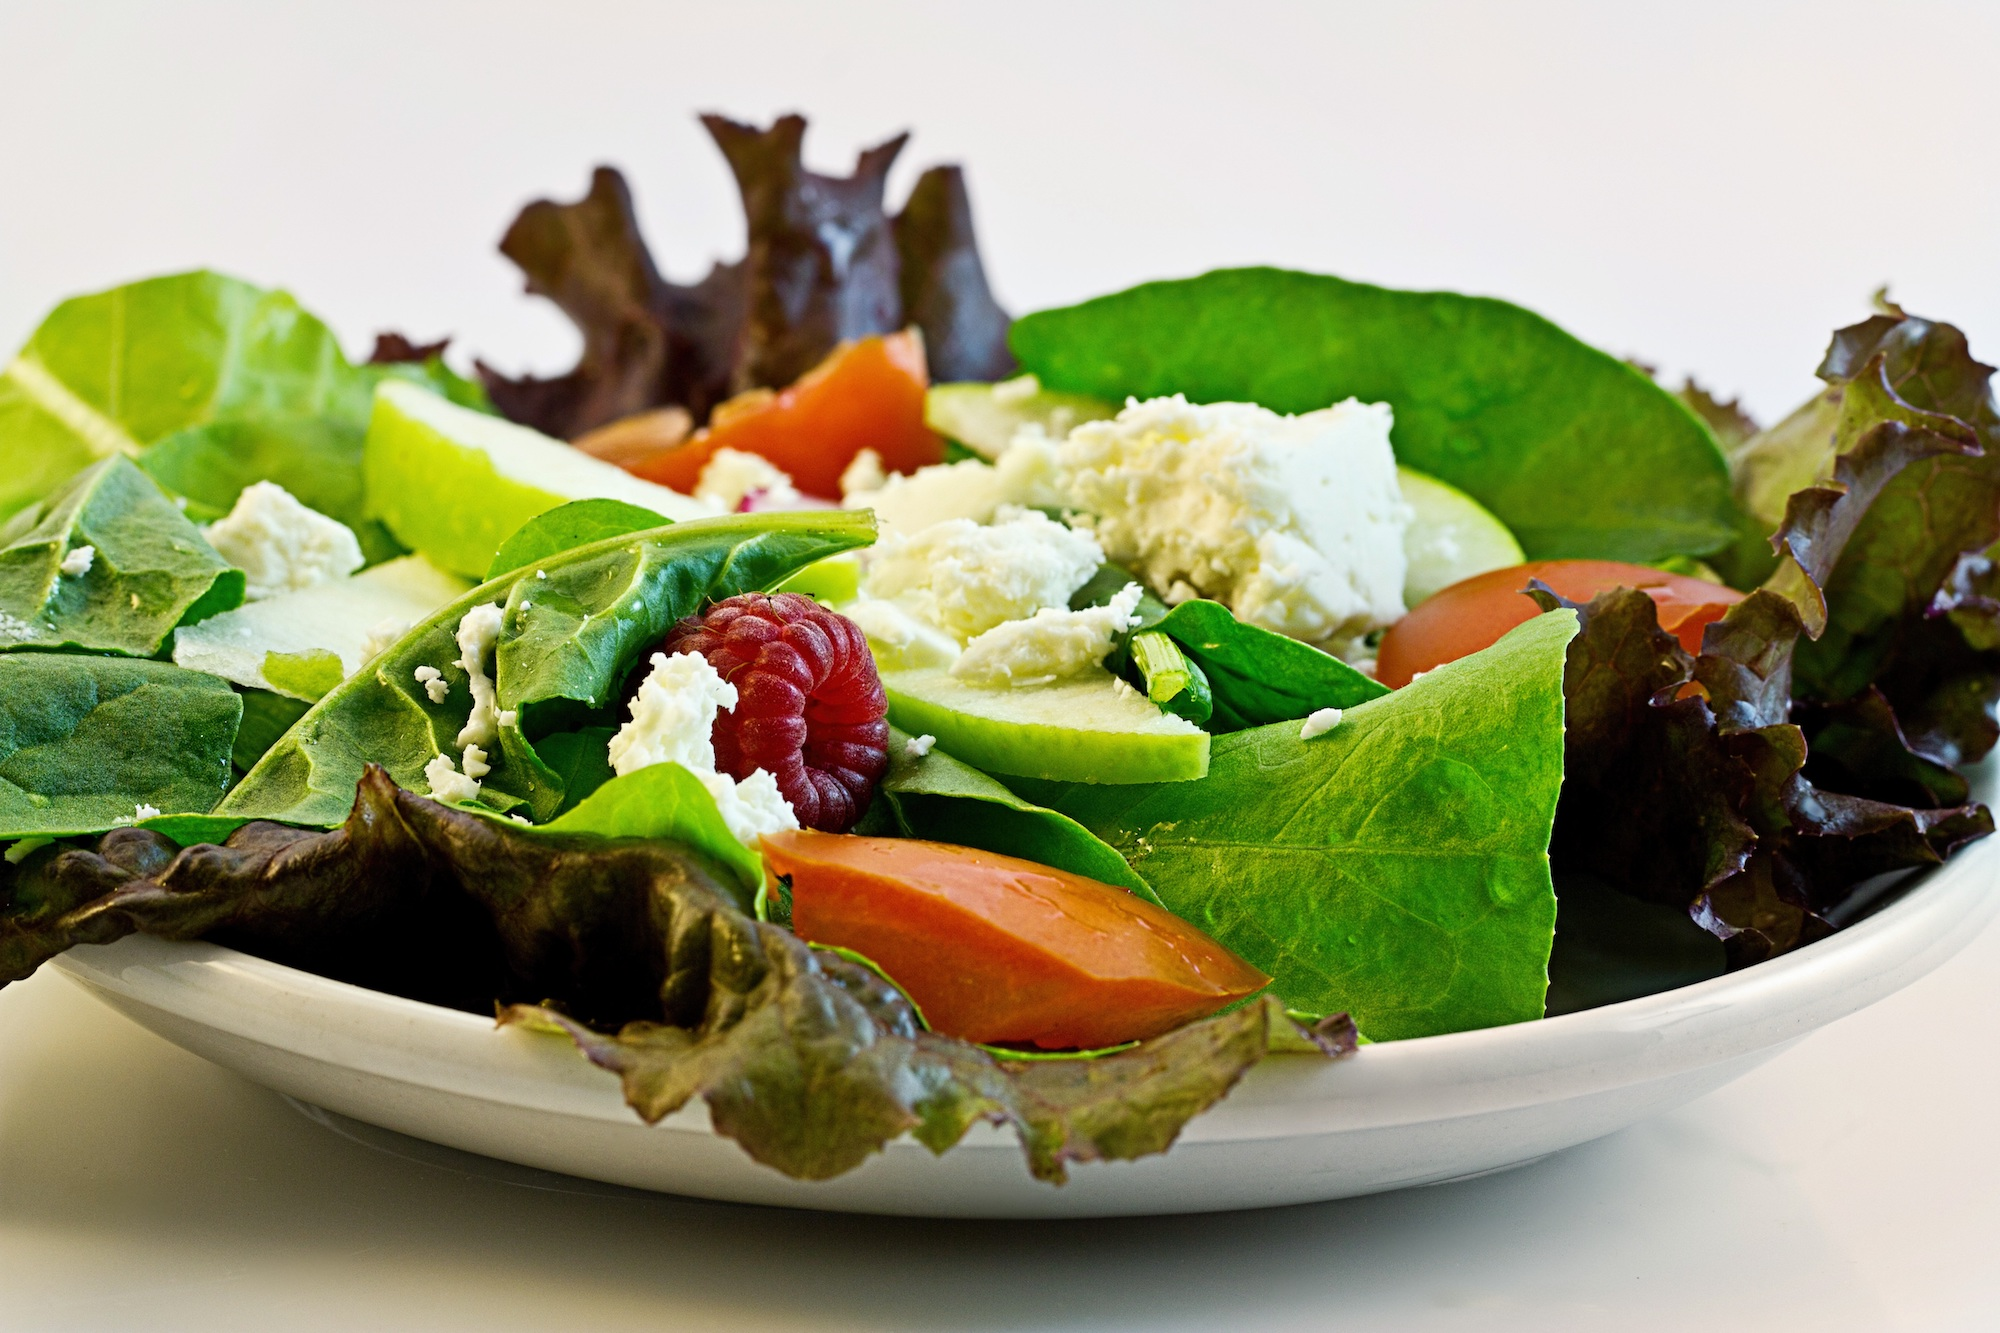 salad-fresh-food-diet-54322